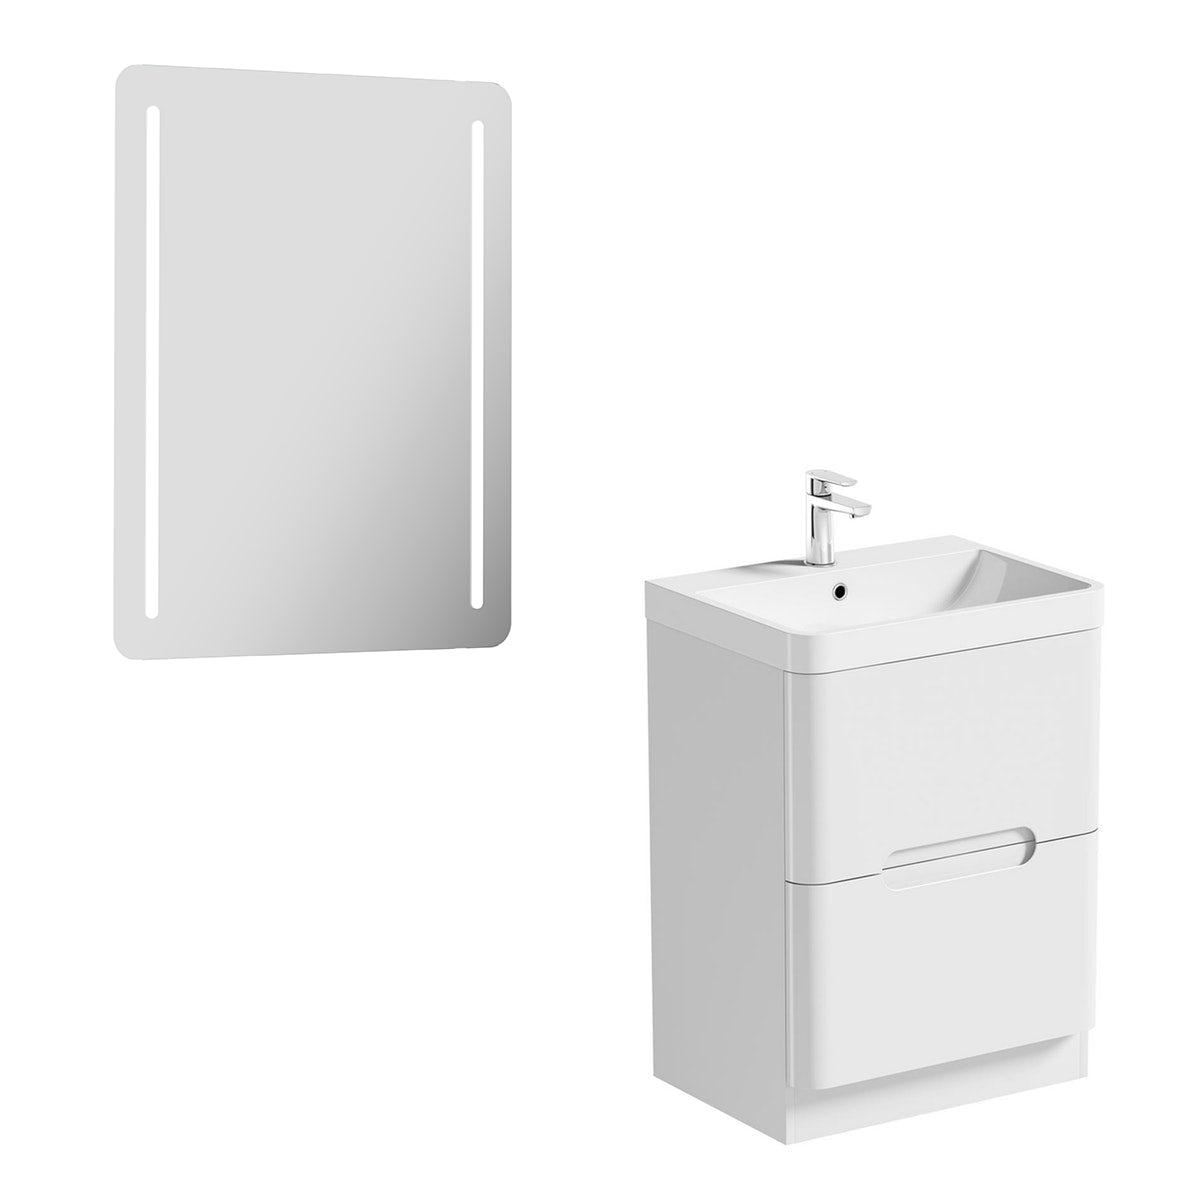 Mode Ellis white vanity drawer unit 600mm and mirror offer